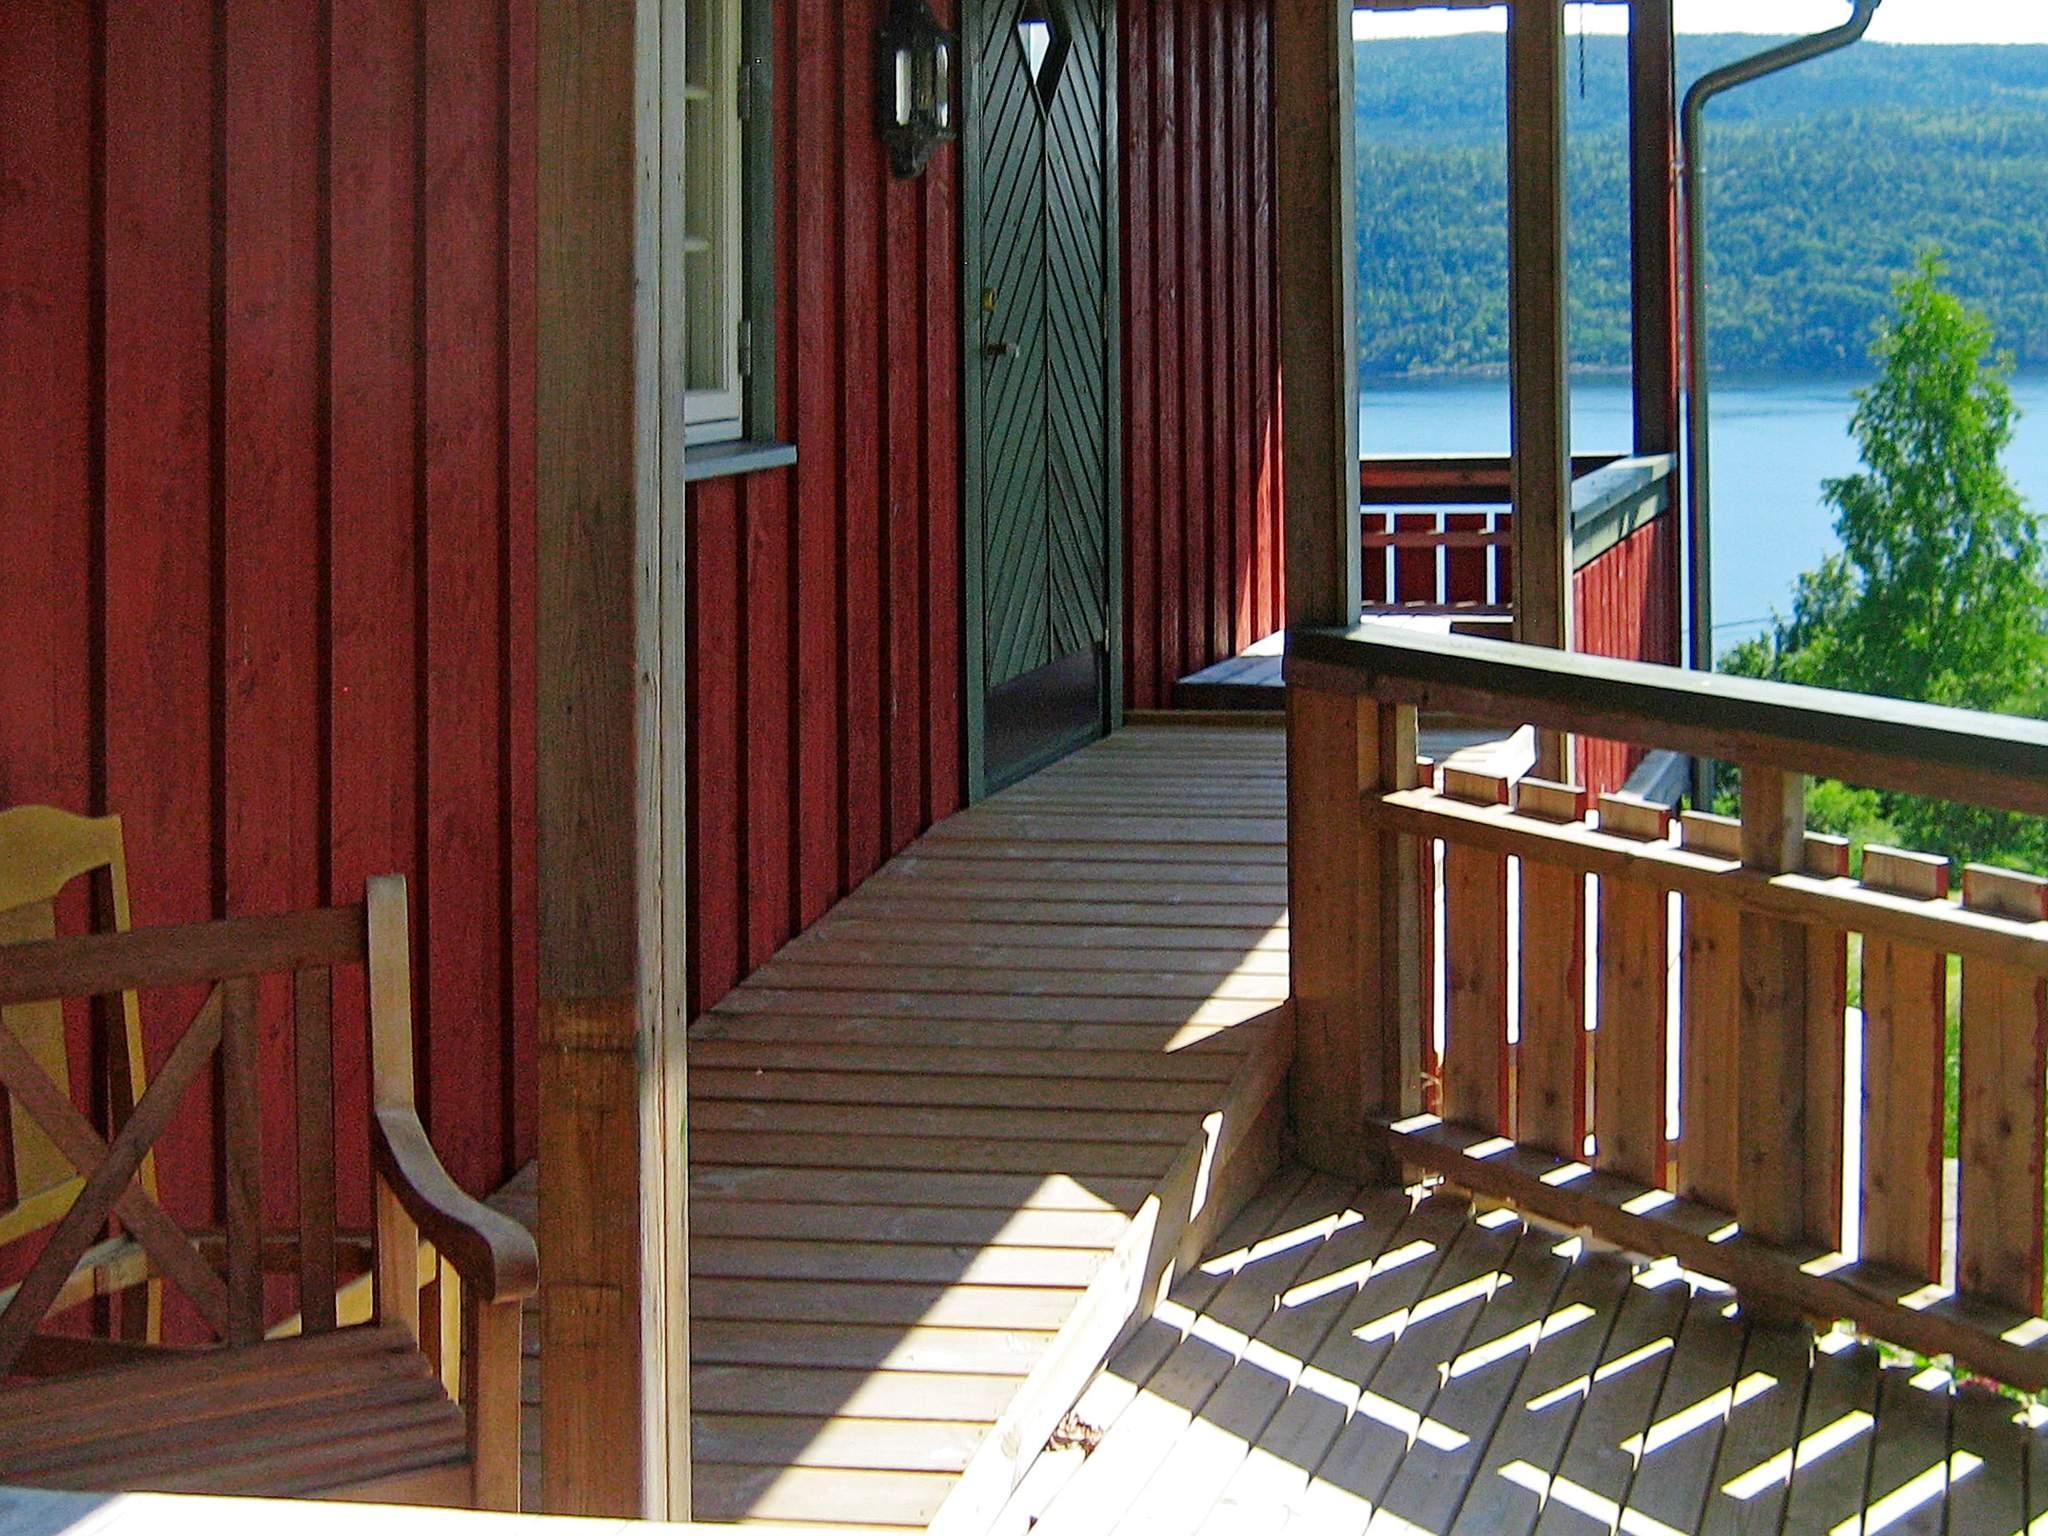 Ferienhaus Fosen (594822), Follafoss, Tröndelag Nord - Trondheimfjord Nord, Mittelnorwegen, Norwegen, Bild 20